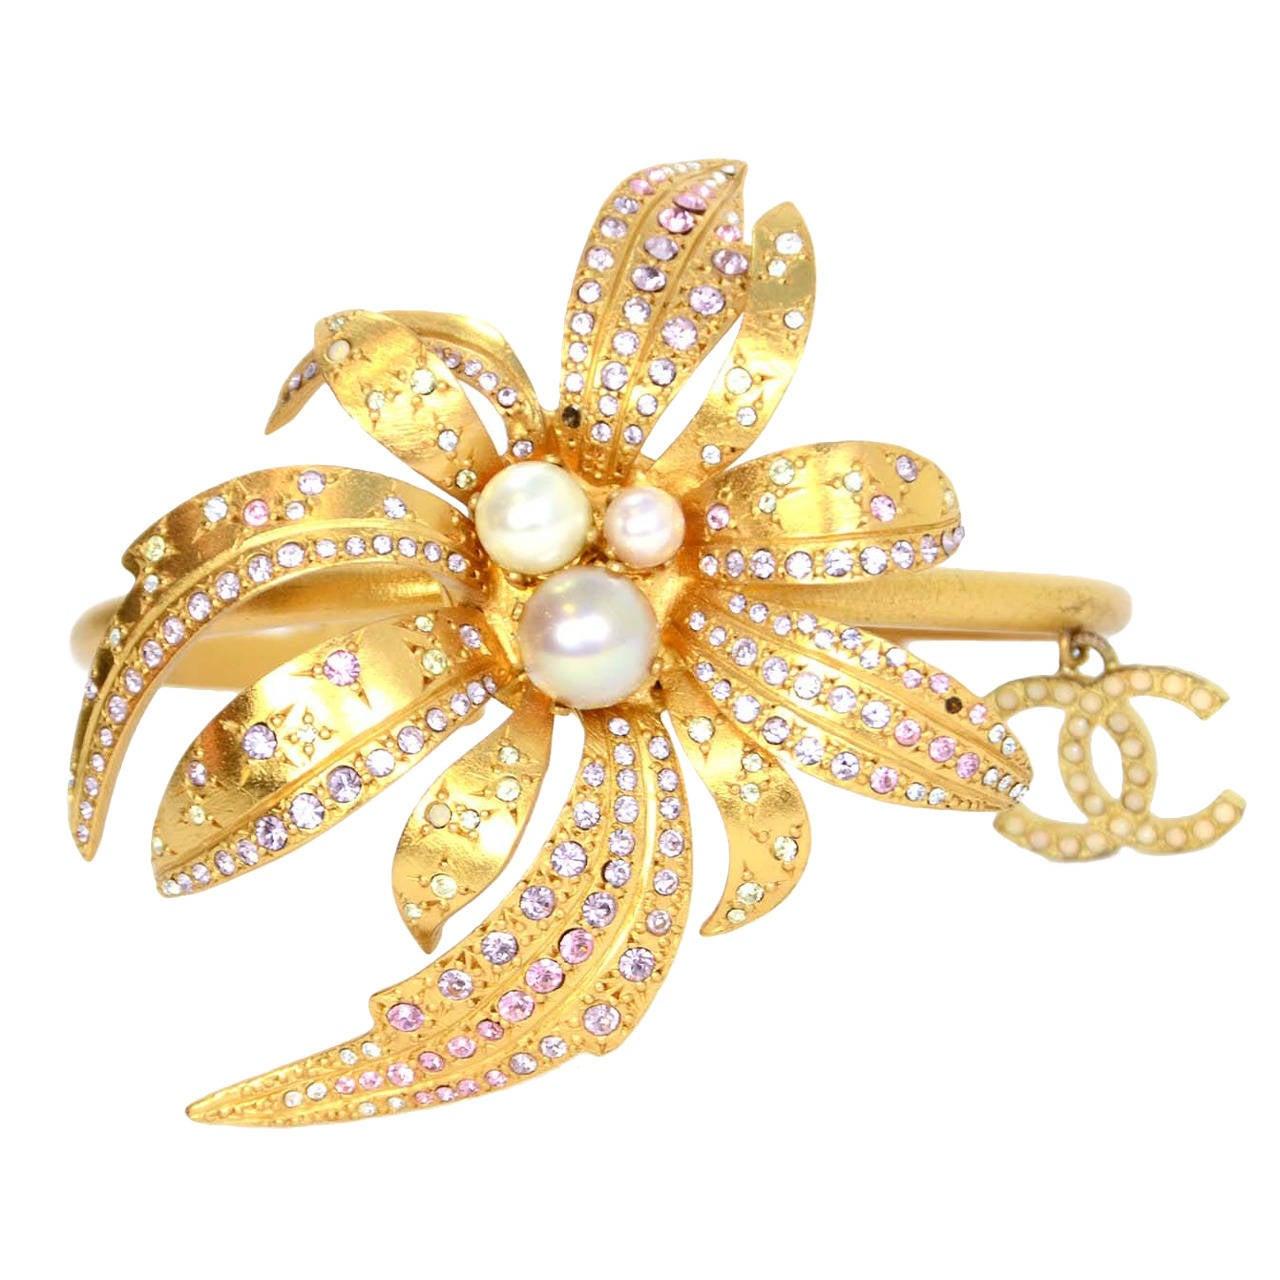 CHANEL 2002 Gold Bracelet w/Pink Rhinestone Flower & Pearls 1